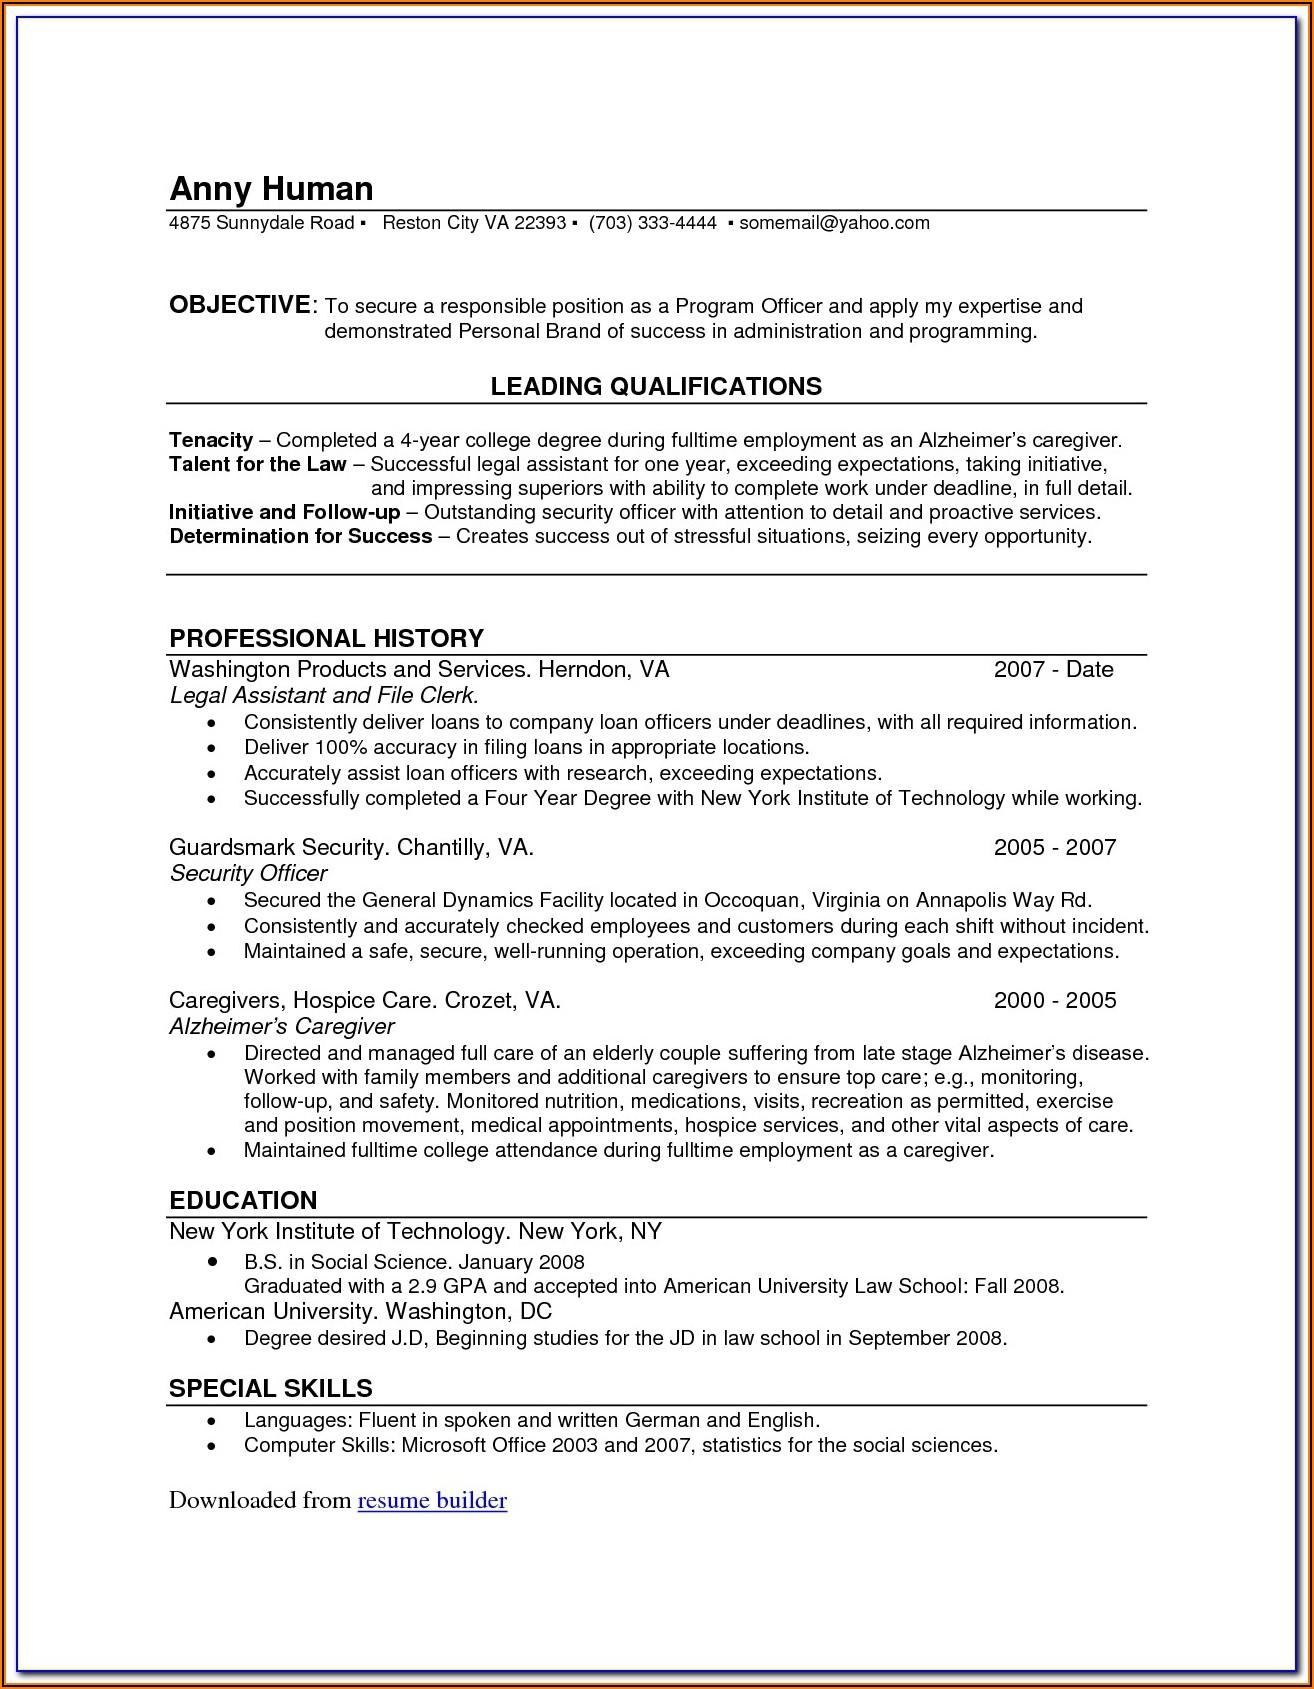 100 Percent Free Resume Maker